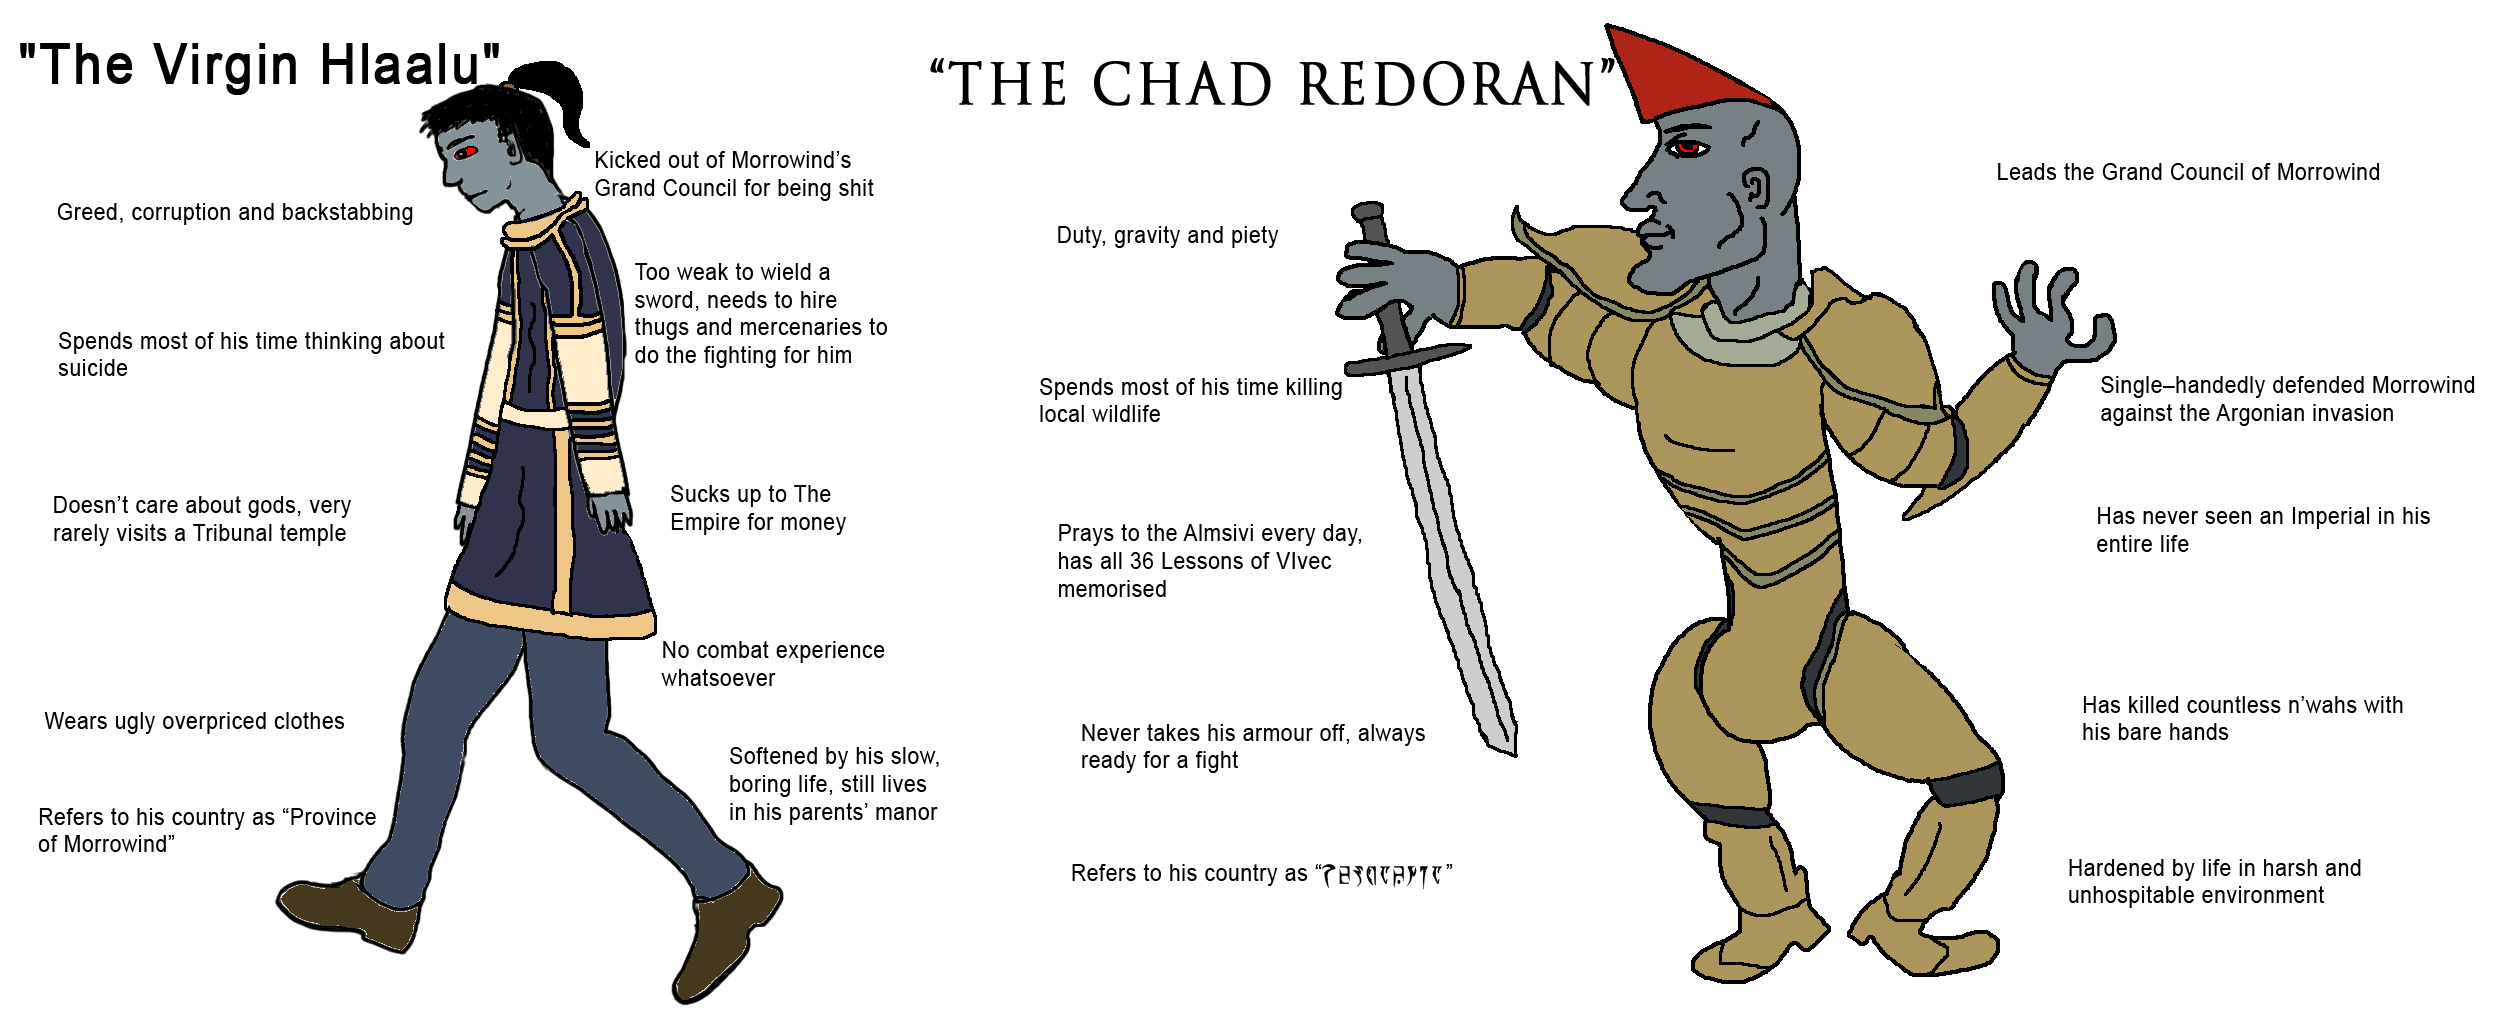 Technically not a TES III: Morrowind meme, but still a meme about Morrowind